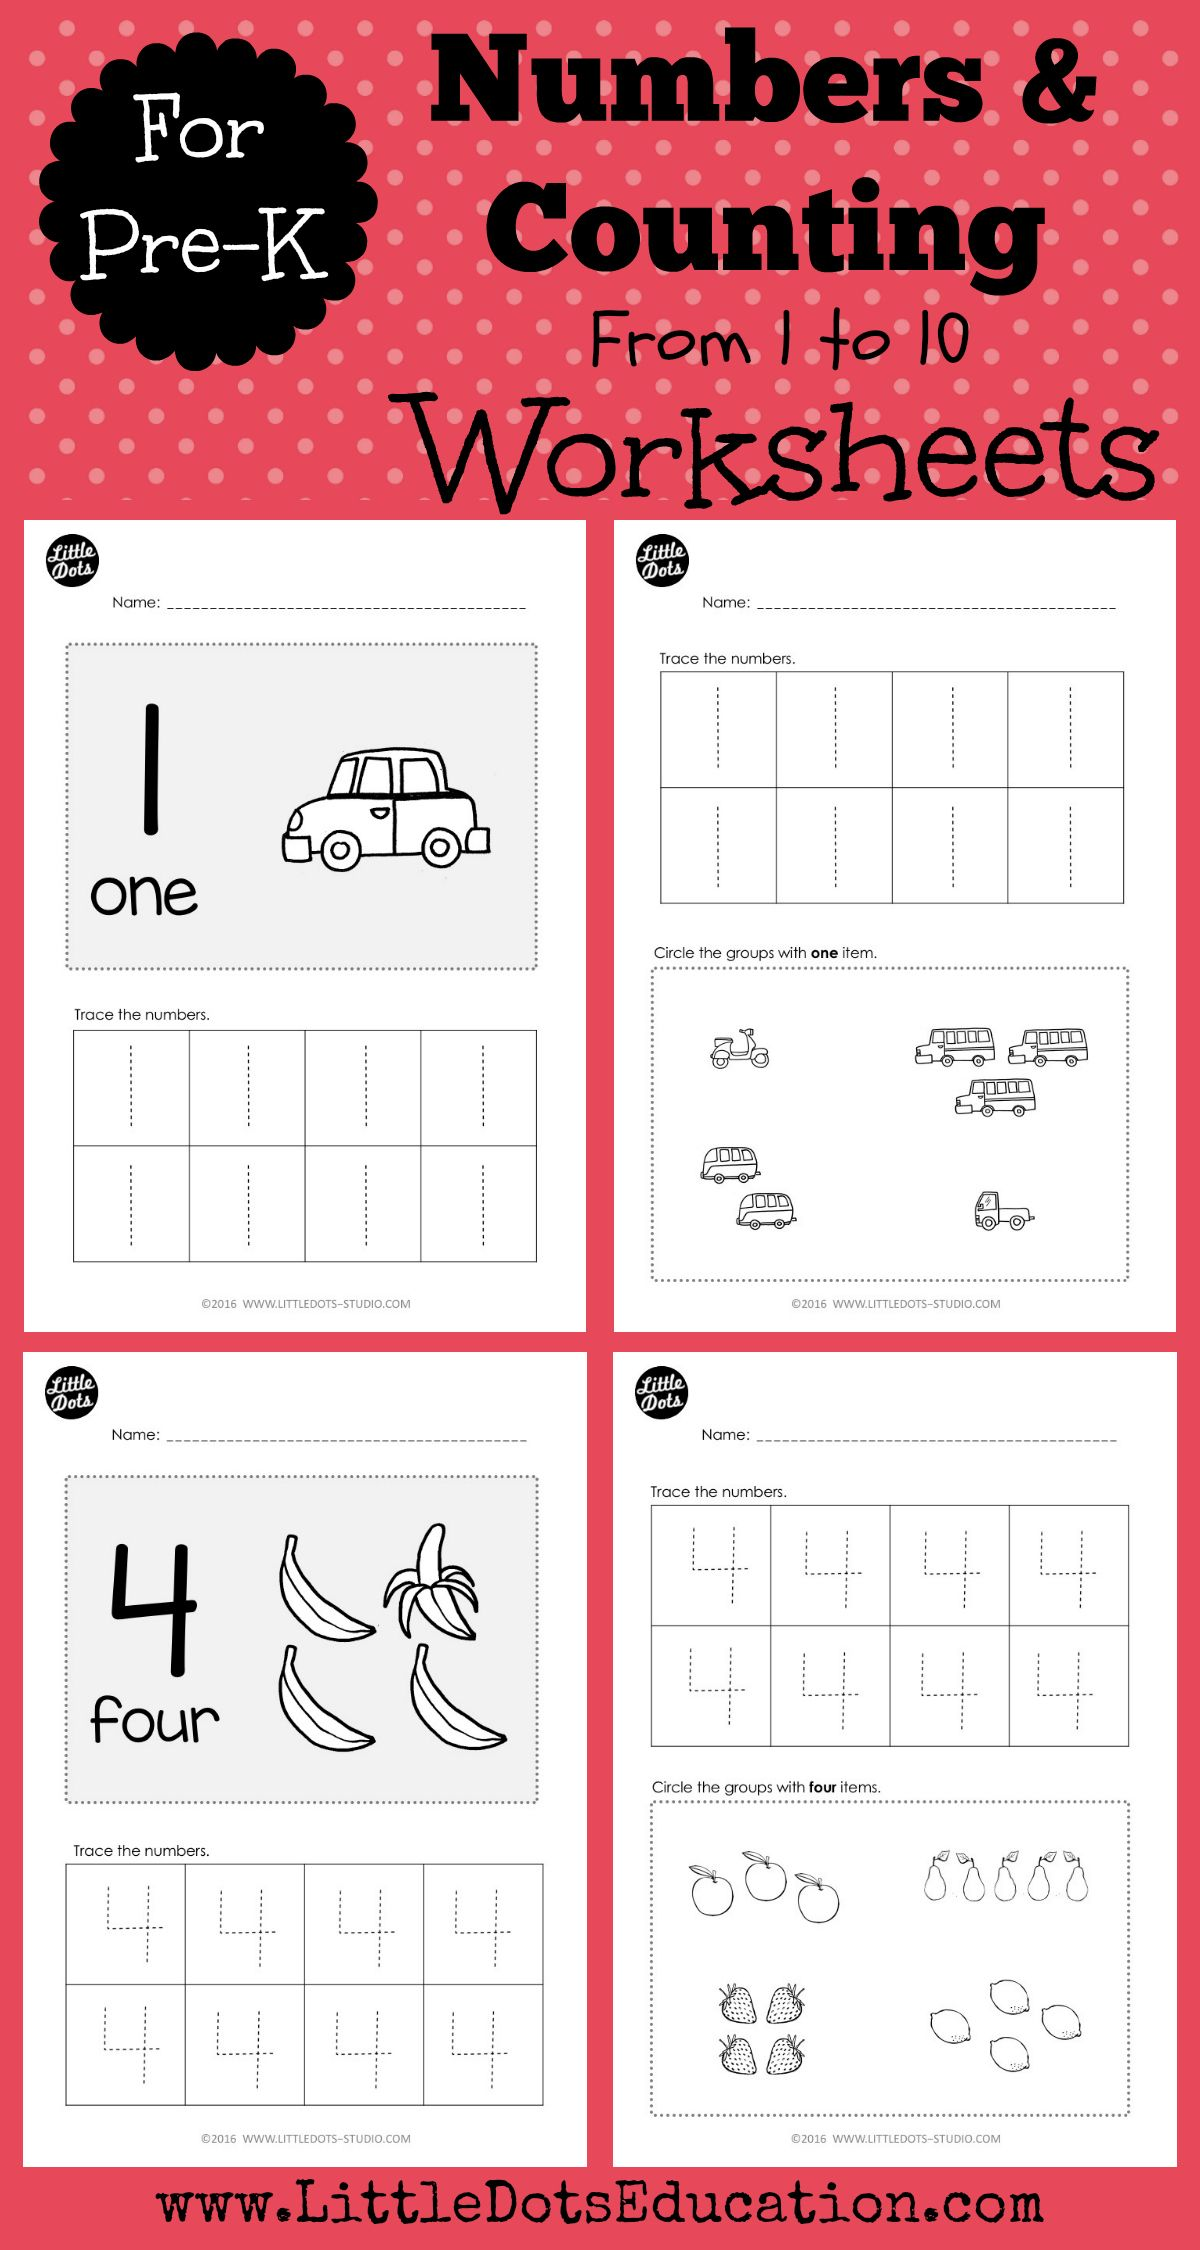 medium resolution of Pre-K Numbers 1 to 10 Worksheets and Activities   Counting activities  preschool